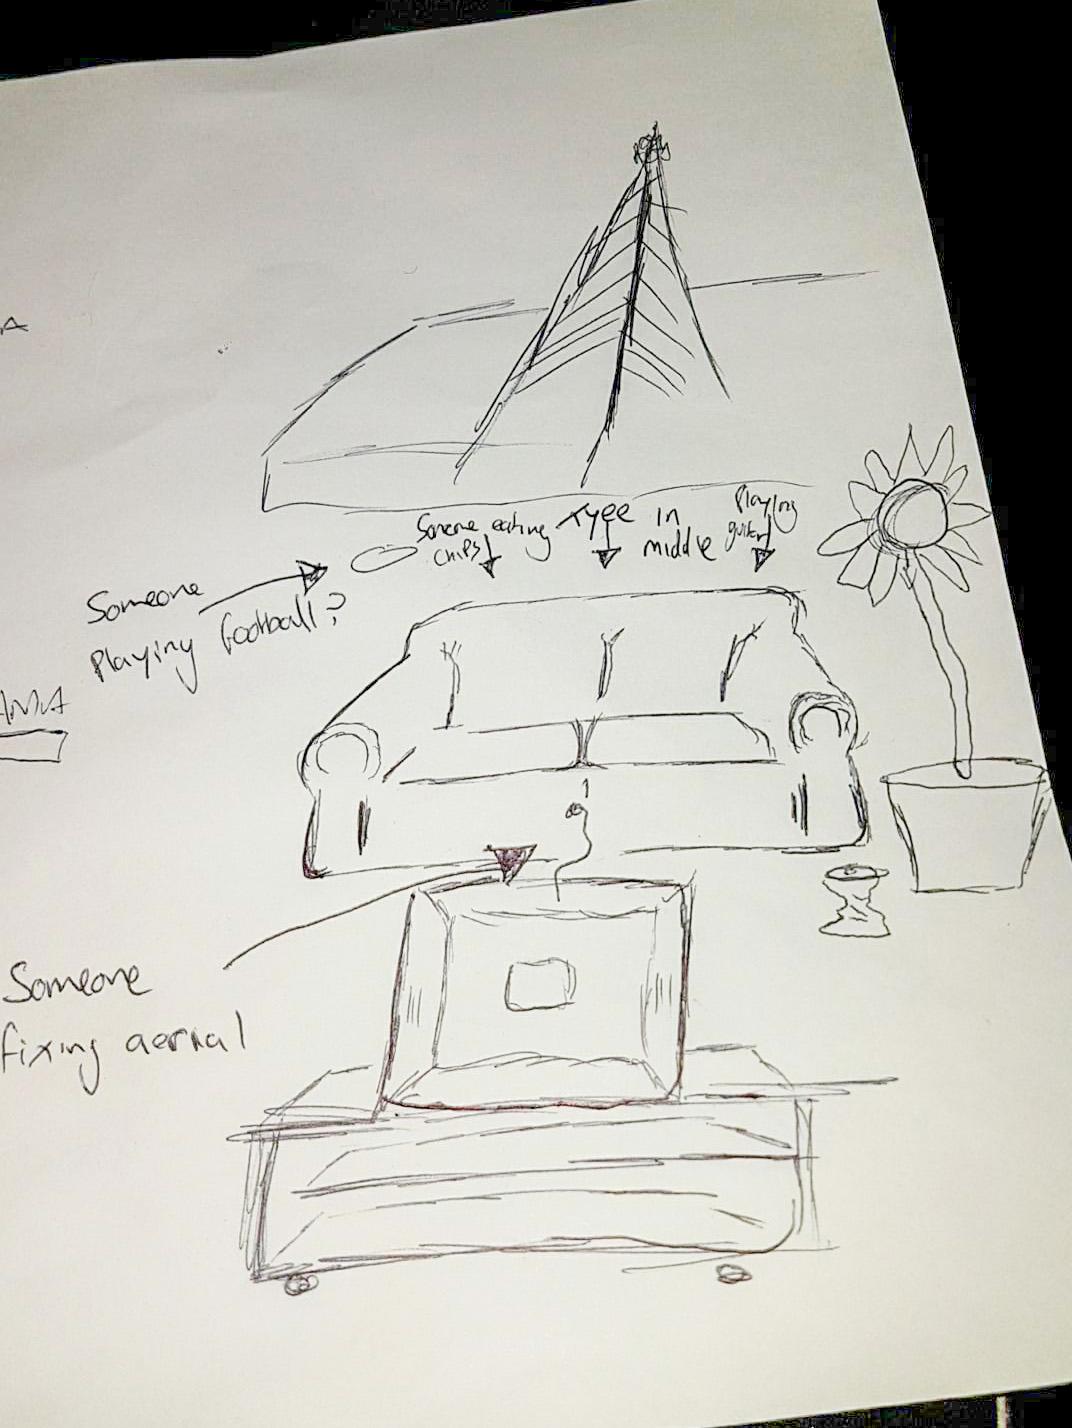 Thumbnail sketch for photo shoot